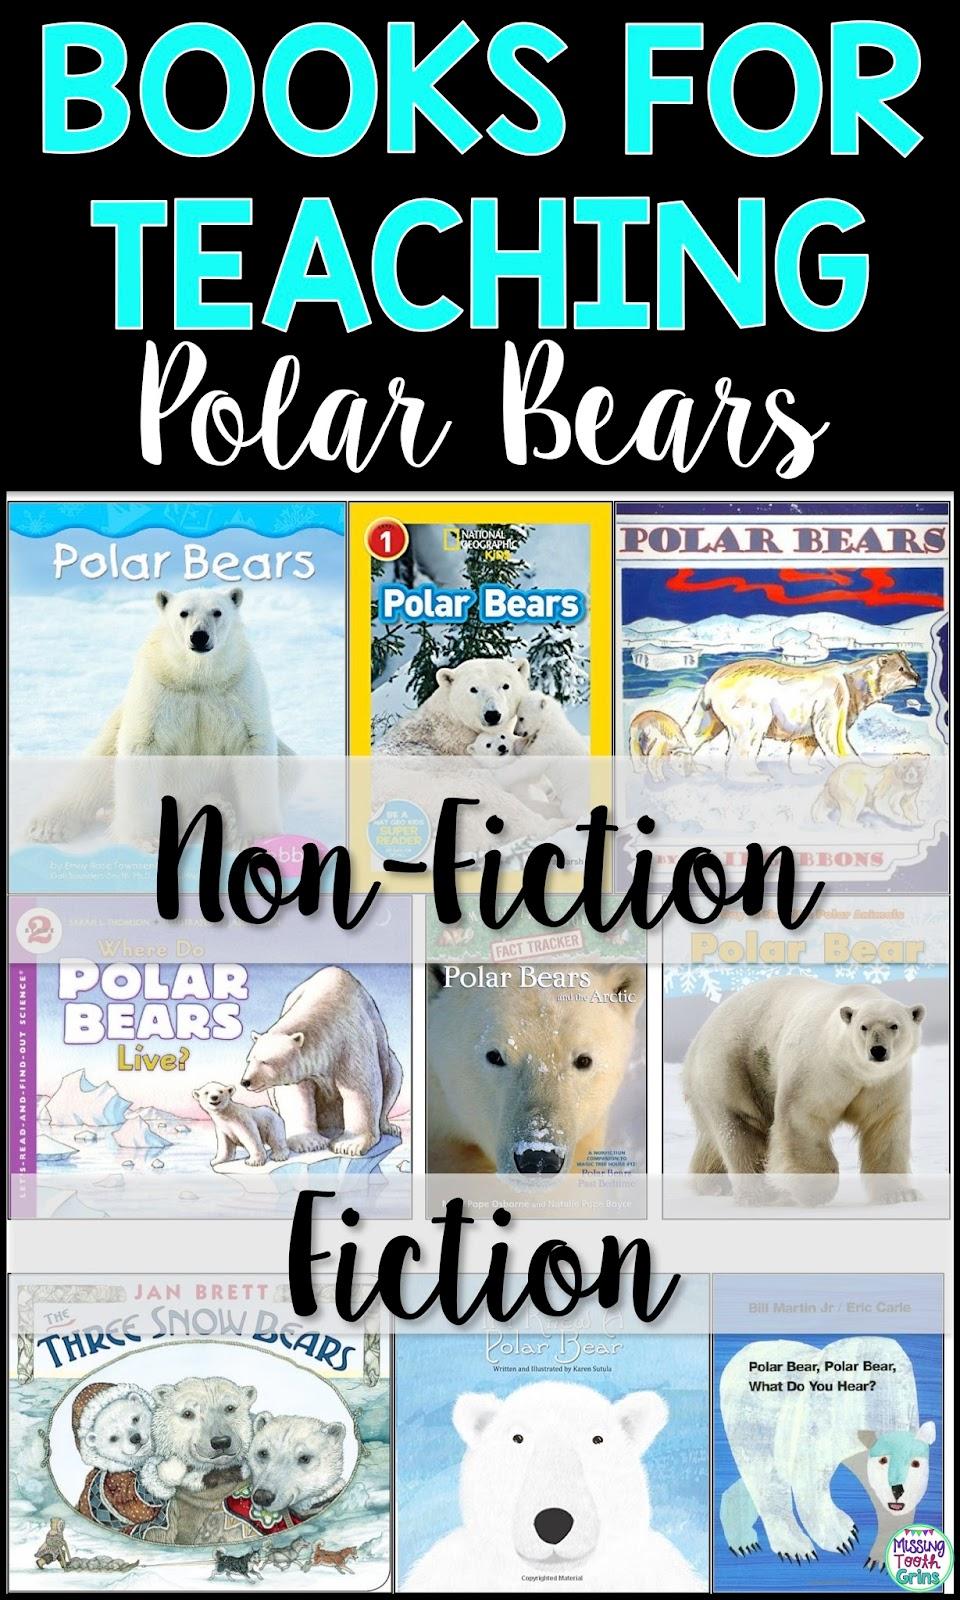 fiction books non polar bears writing teaching animals kindergarten arctic informative nonfiction students bear grade missing artic animal missingtoothgrins need